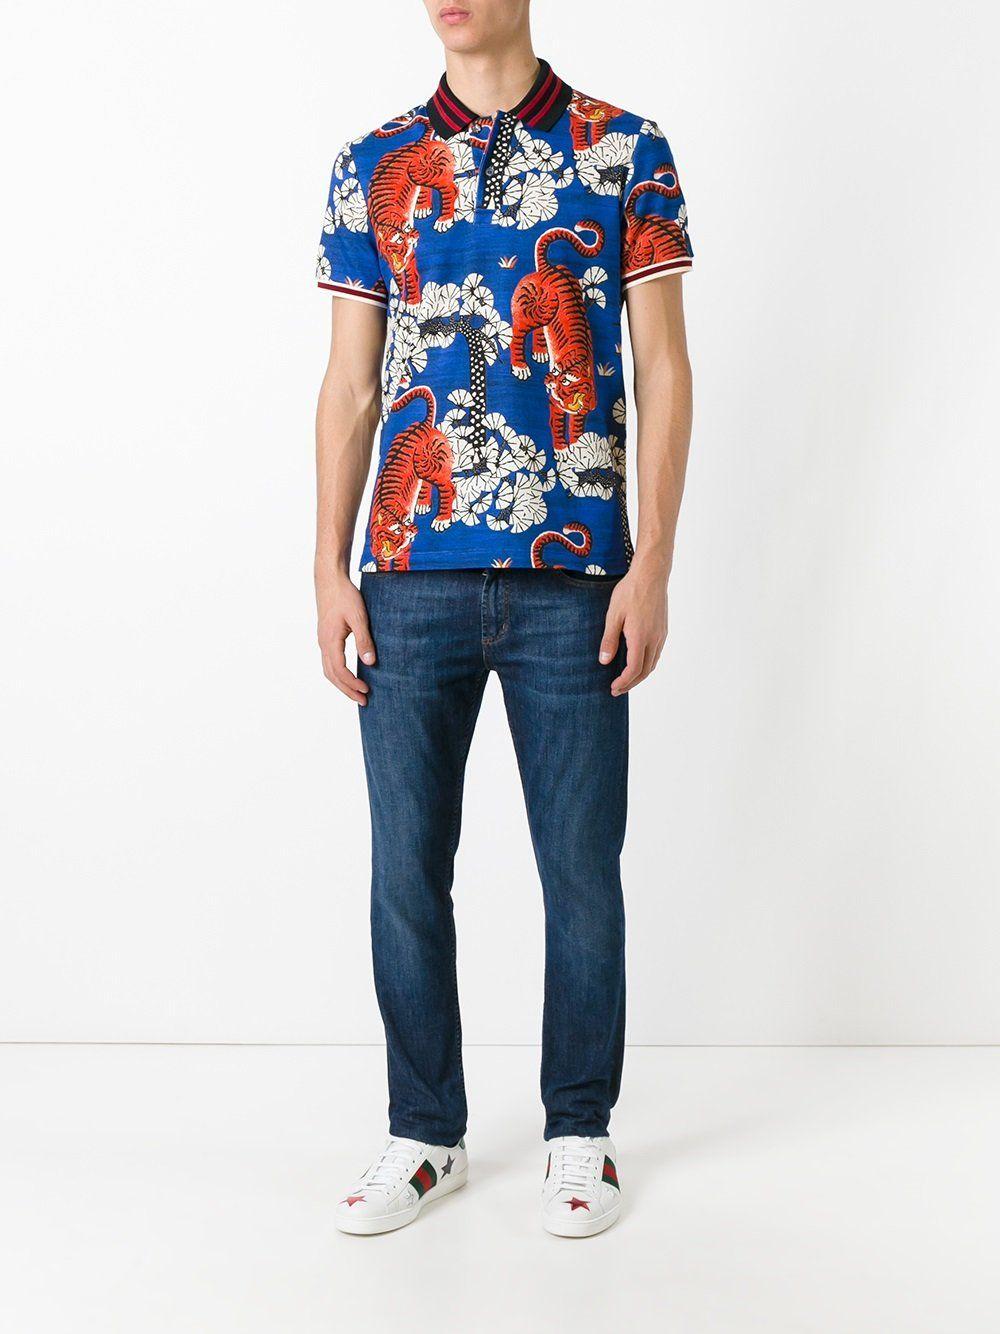 Camisas De Verano. Zapatillas. Pantalones. Gucci polo con estampado de  tigres de Bengala Polos Con Estampados 55e5768edc1f7